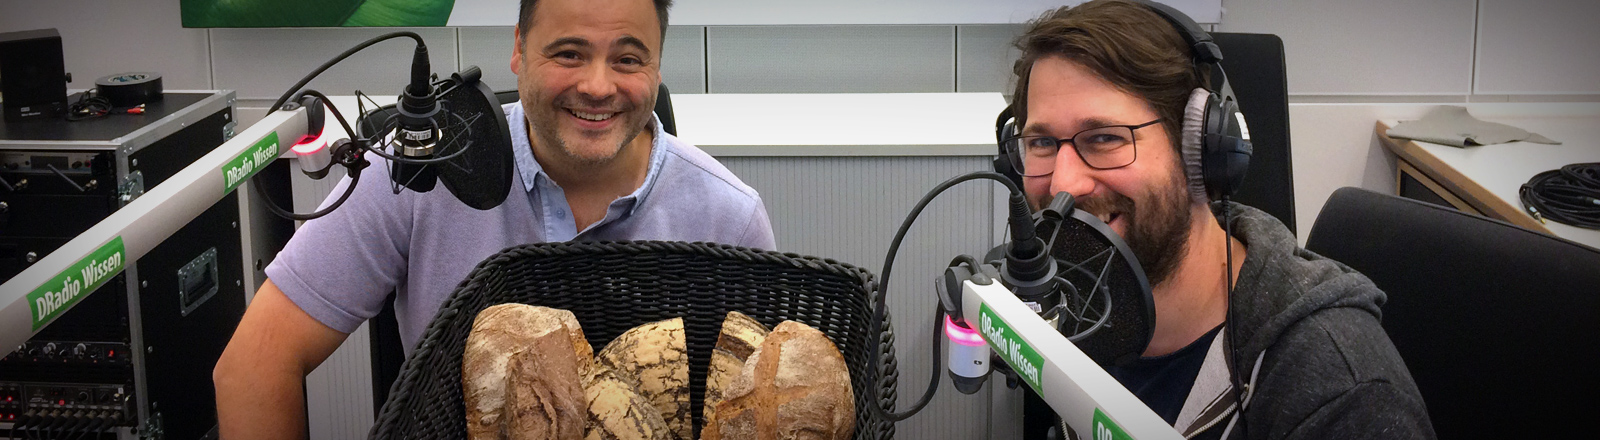 Brotsommelier Ralf Gießelmann und Sebastian Sonntag